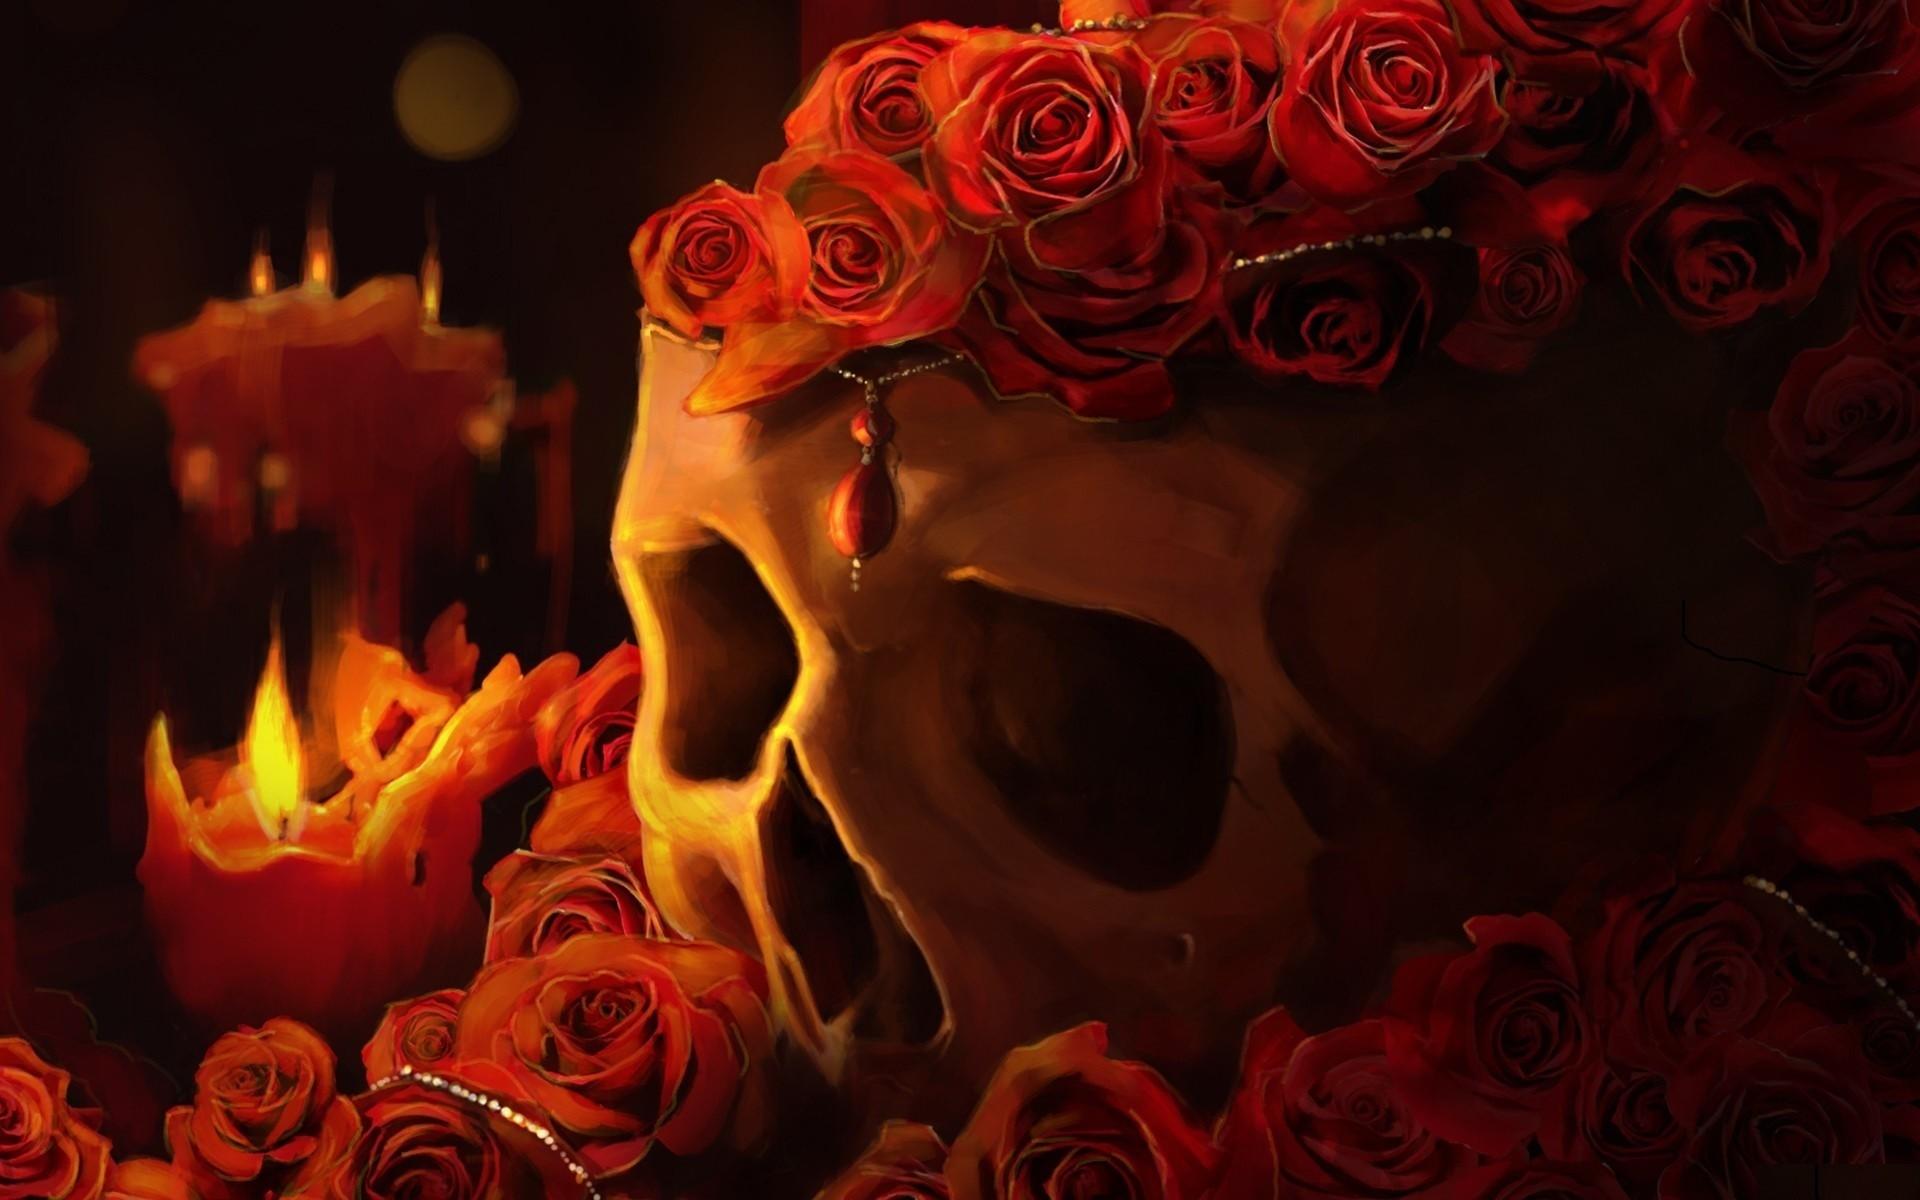 Skulls Roses Candles Fantasy candle skull goth gothic fire dark wallpaper |  | 117384 |